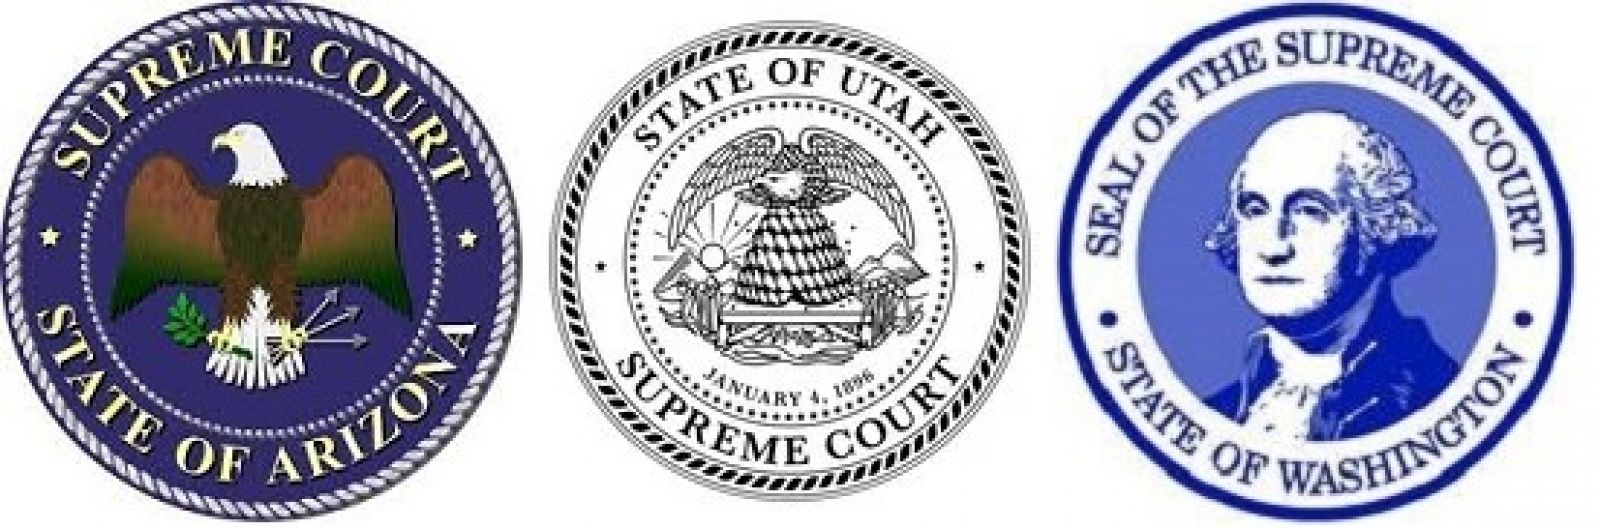 Supreme Court Seals banner image